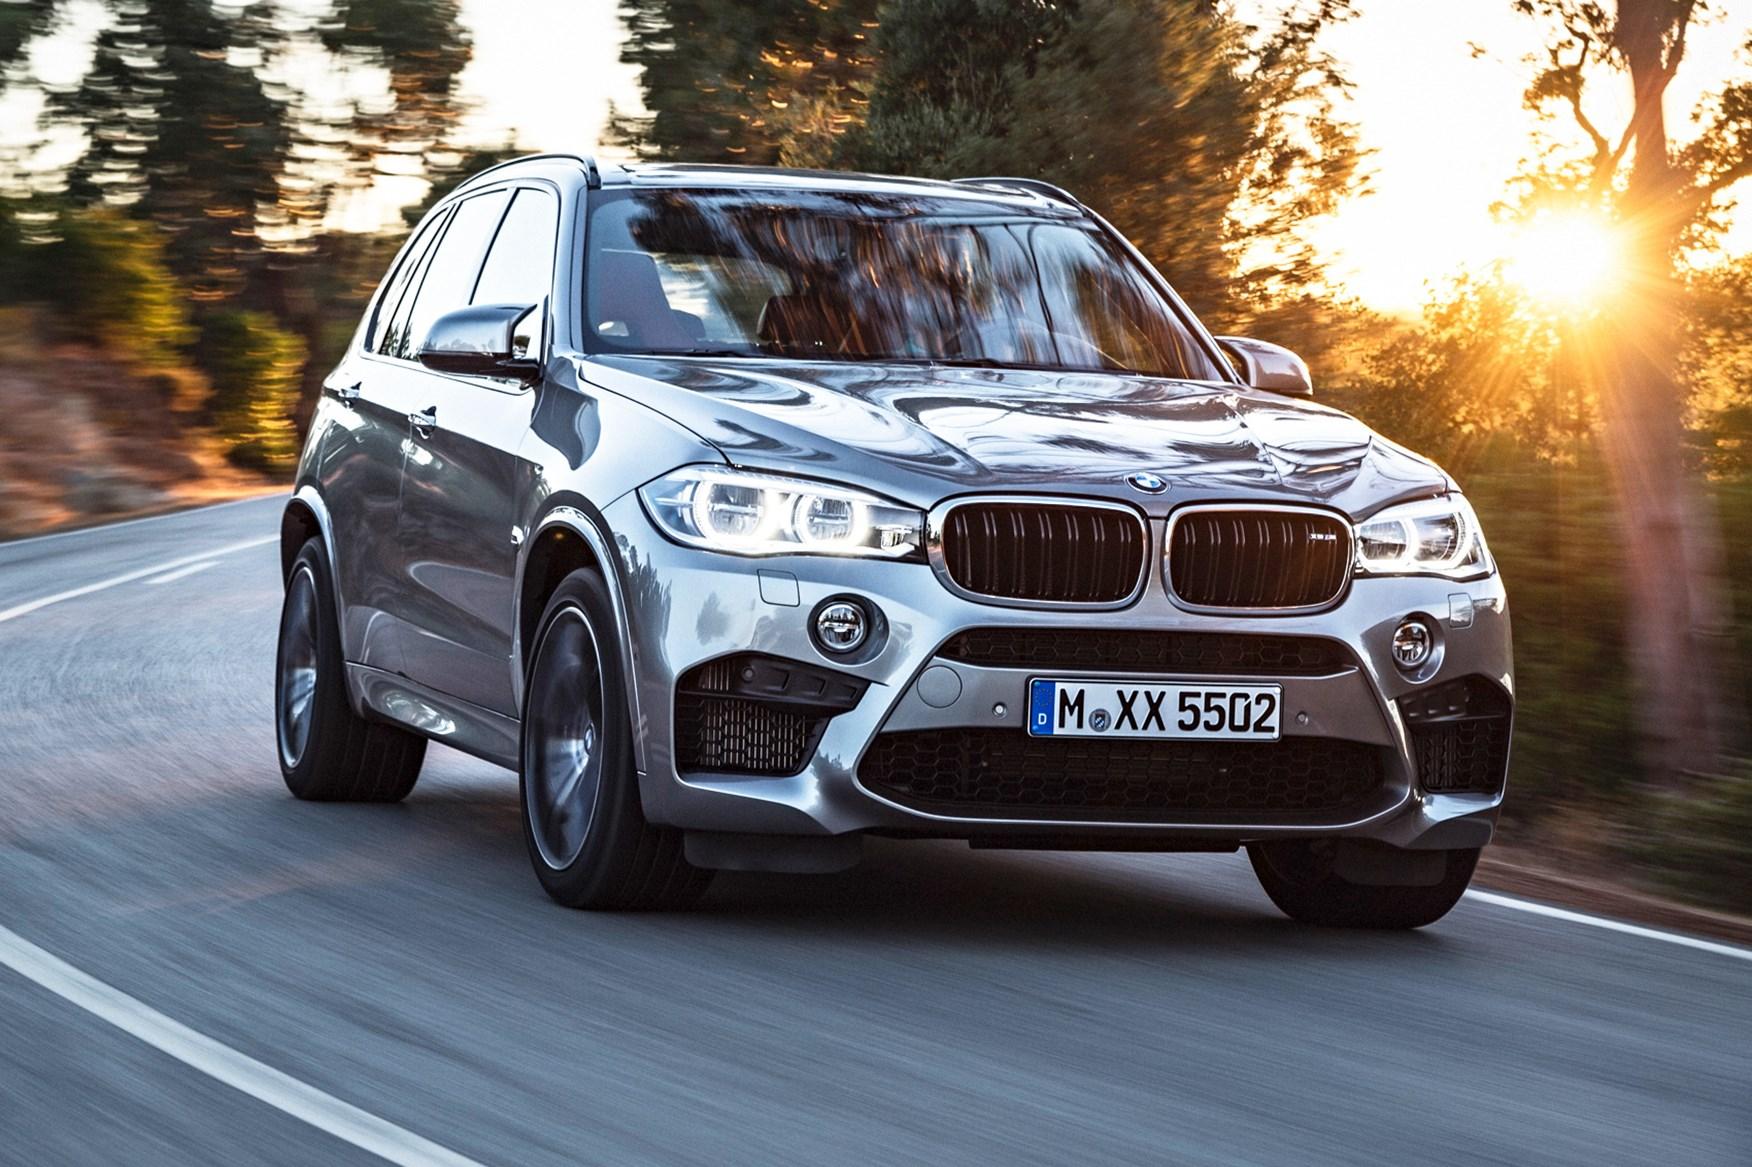 Bmw X5 M 2017 Review By Car Magazine